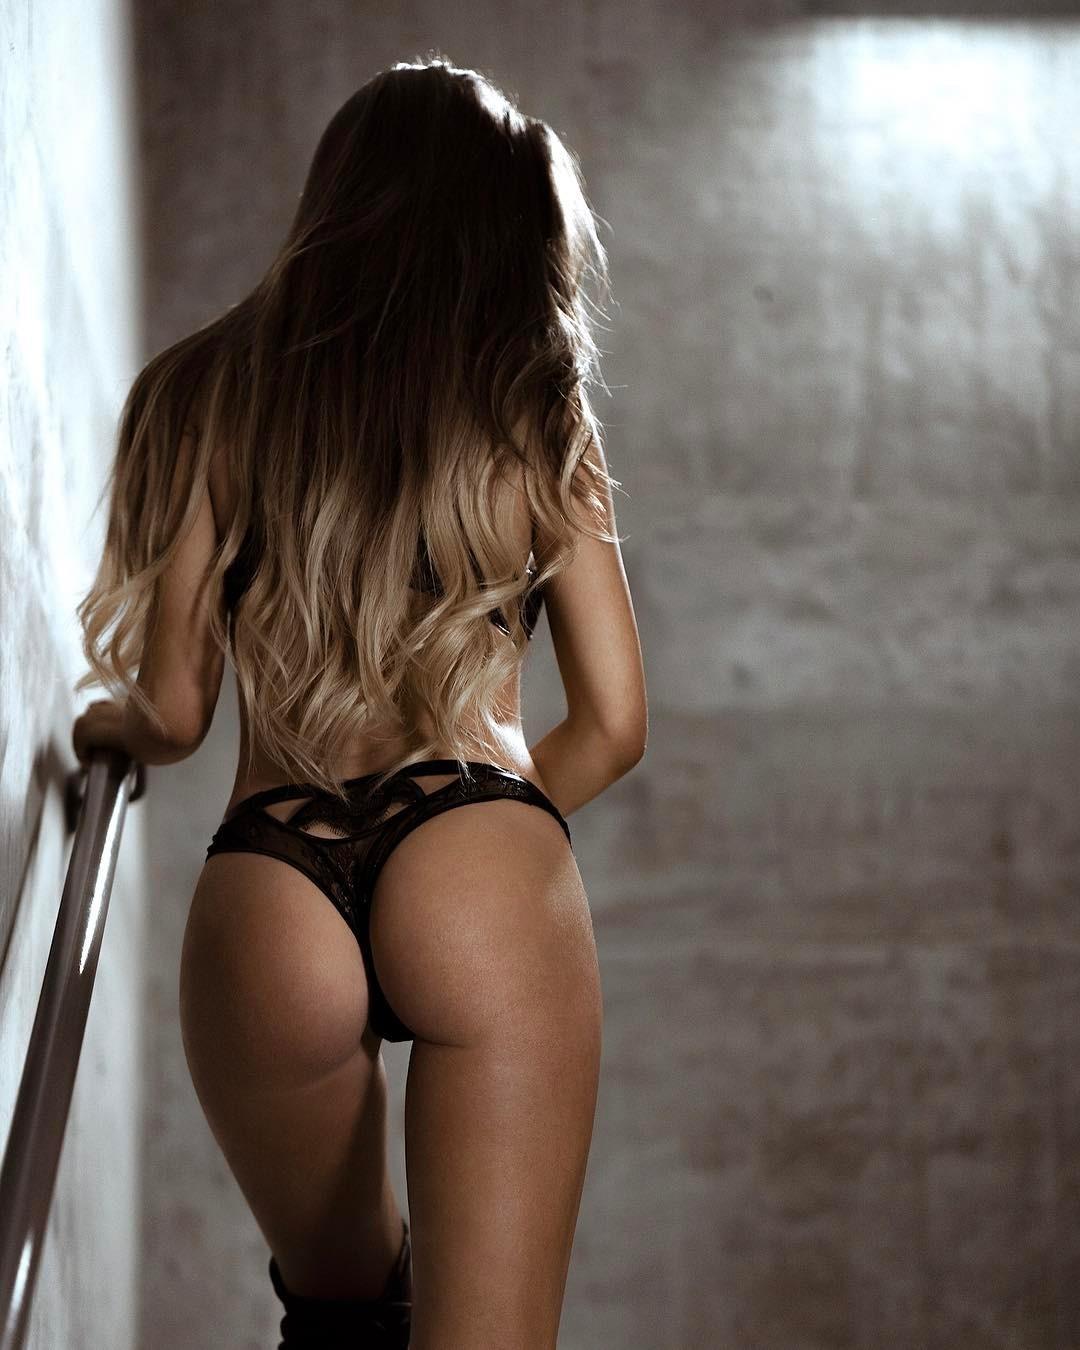 jeune femme sexy du 48 en photo sexe